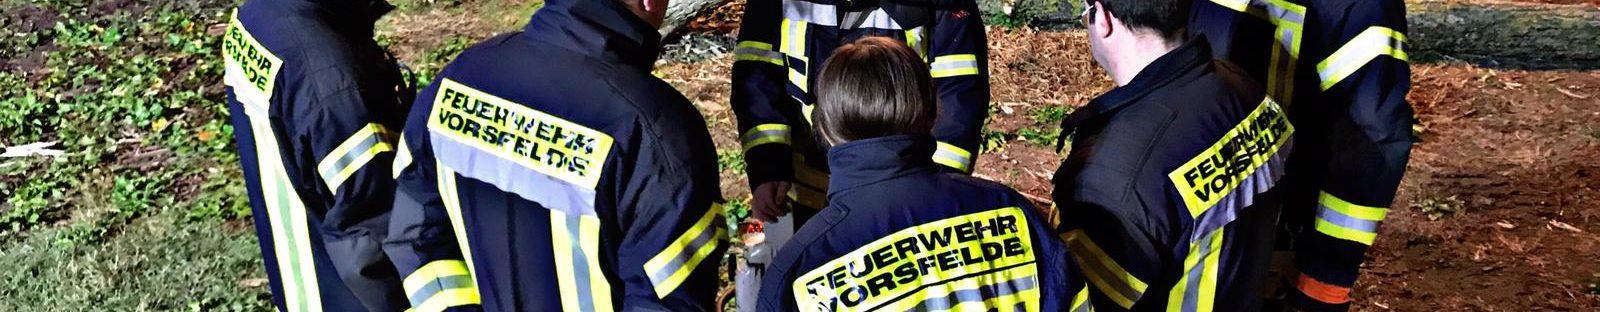 Freiwillige Feuerwehr Vorsfelde